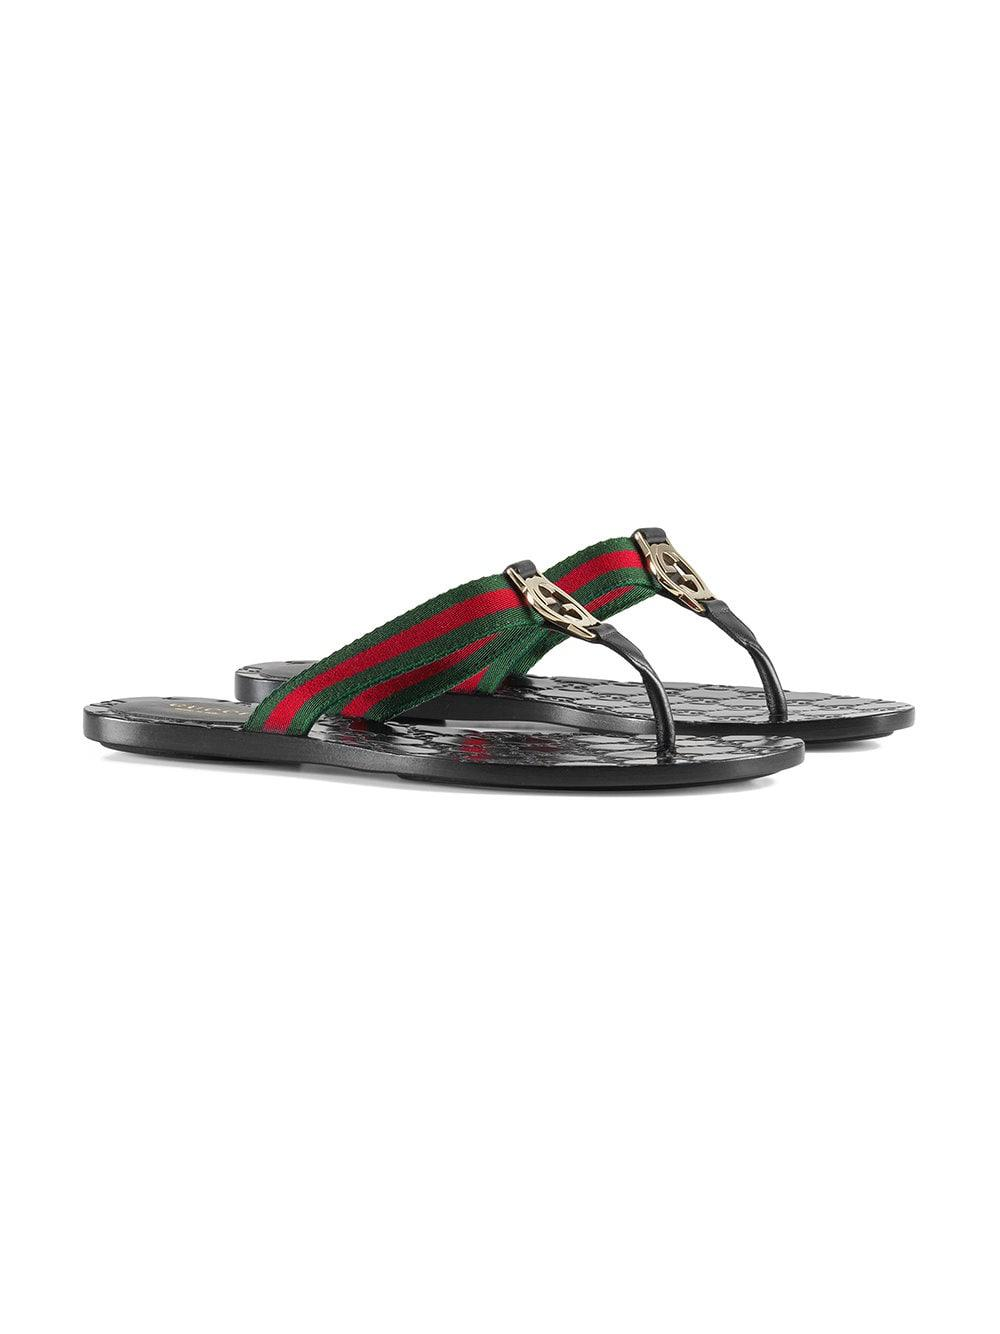 68a83e4a6cb7 Lyst - Gucci GG Thong Web Sandal in Black